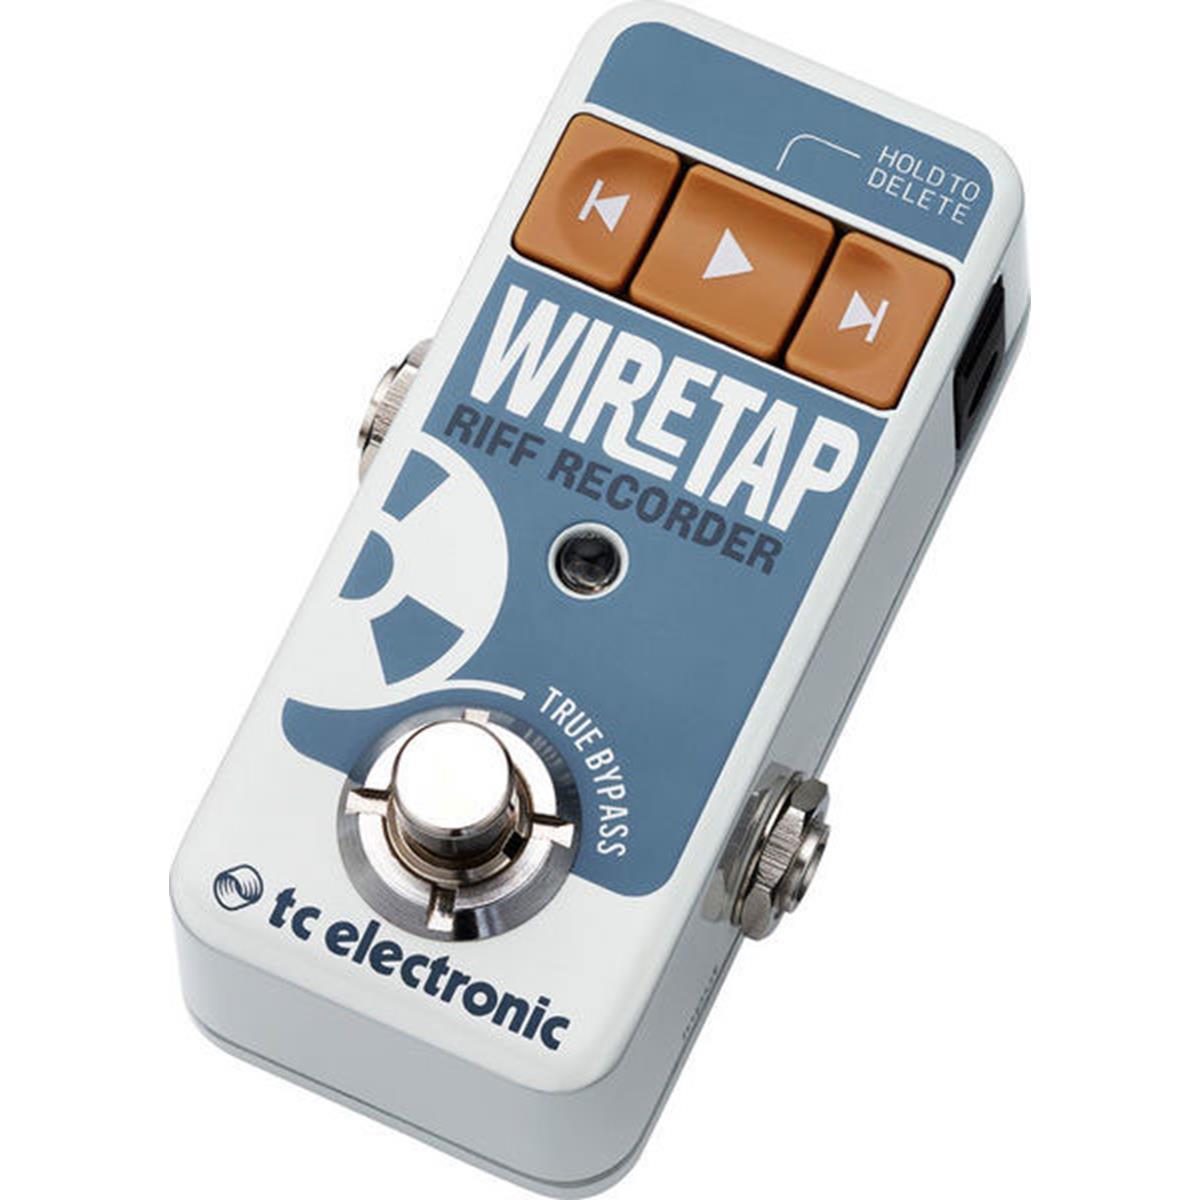 TC-ELECTRONIC-WIRETAP-RIFF-RECORDER-sku-16233